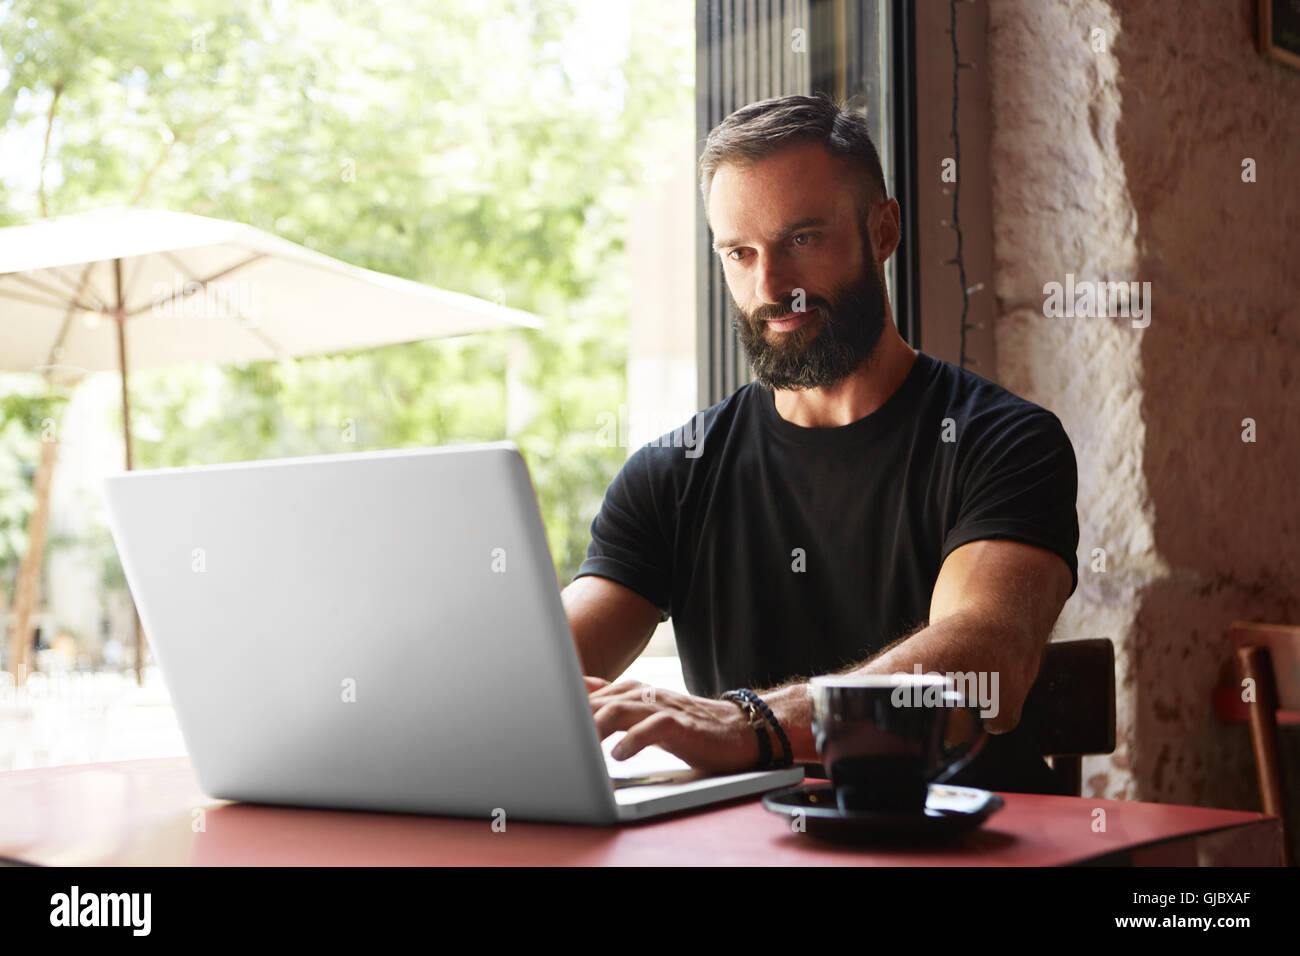 Gut aussehend bärtigen Geschäftsmann tragen schwarze Tshirt Laptop Holztisch Urban Cafe.Young Manager Stockbild